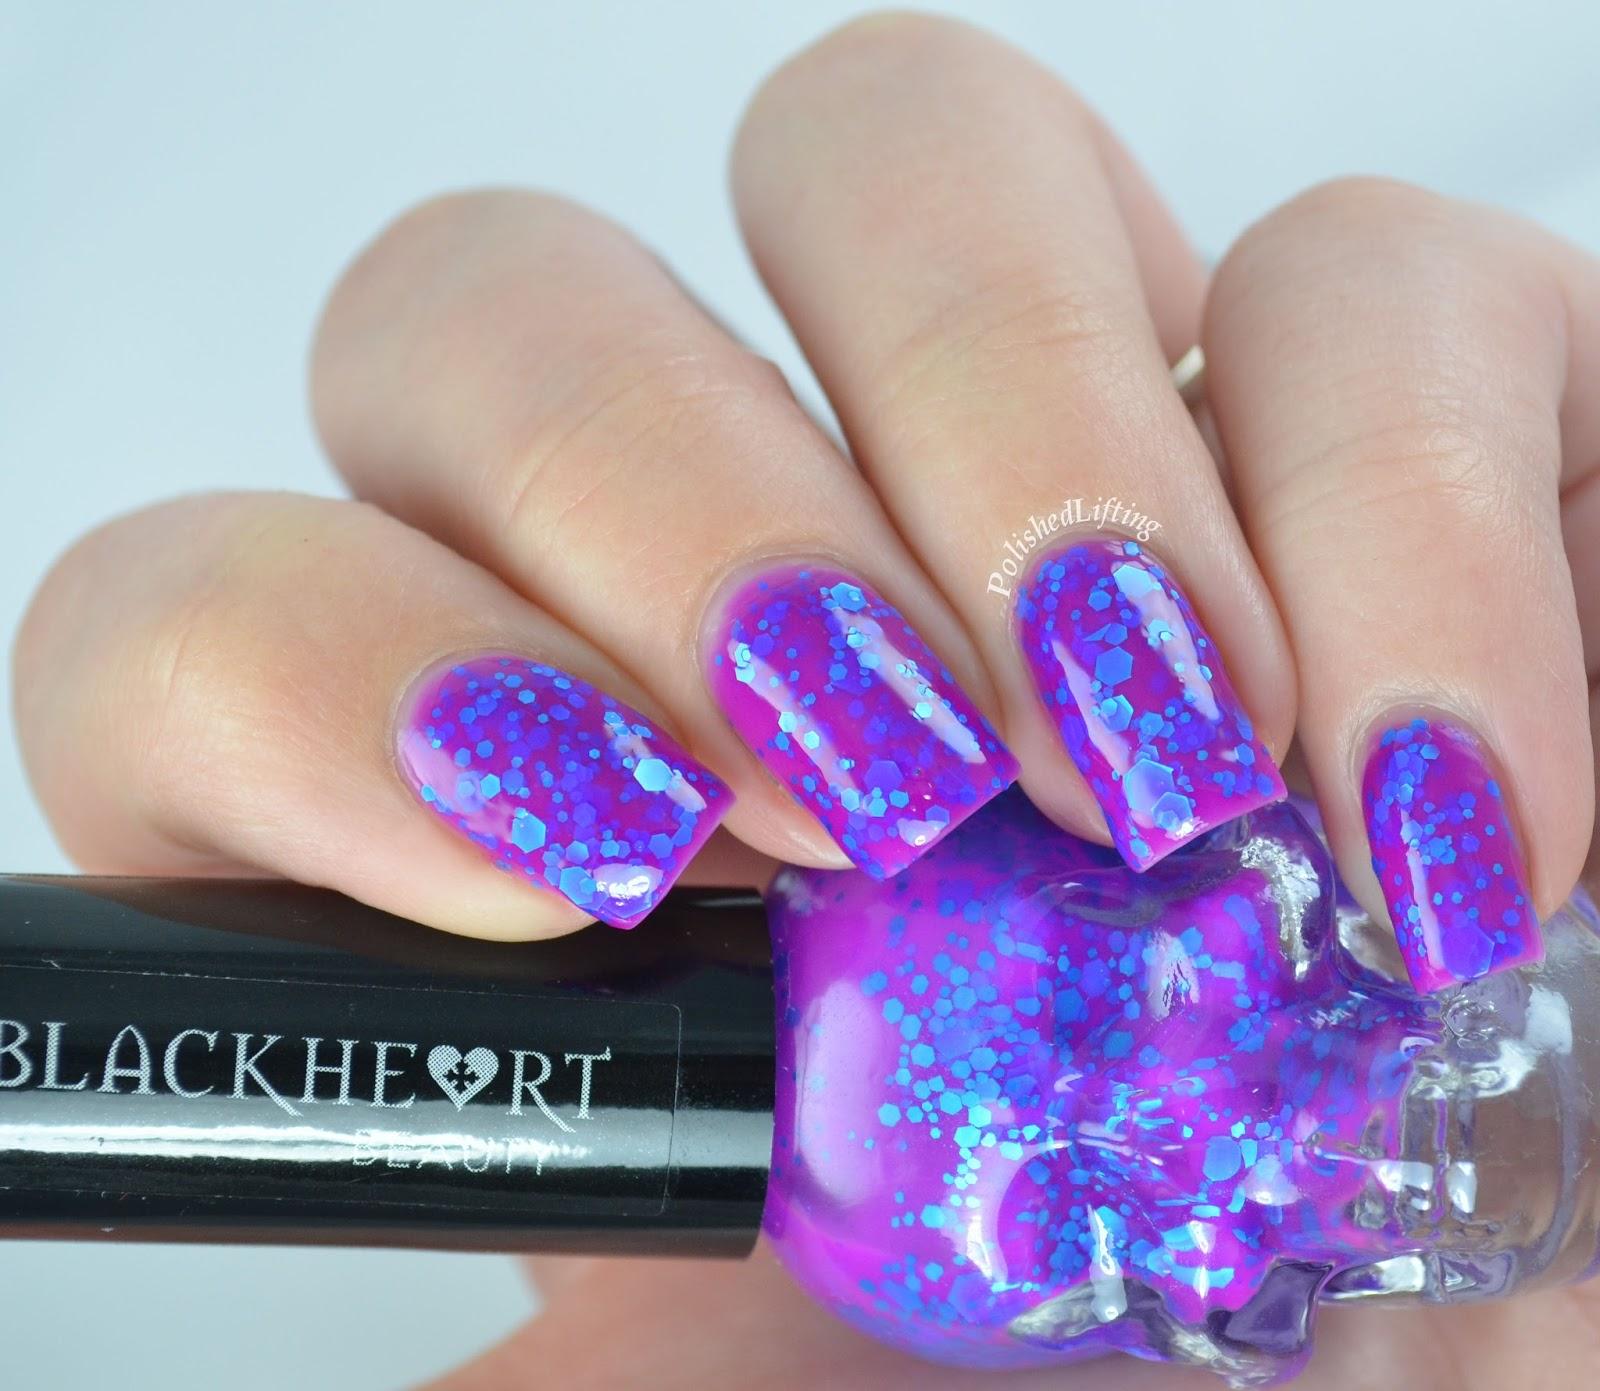 Polished Lifting: Black Heart Beauty Violet & Blue Glitter Nail Polish